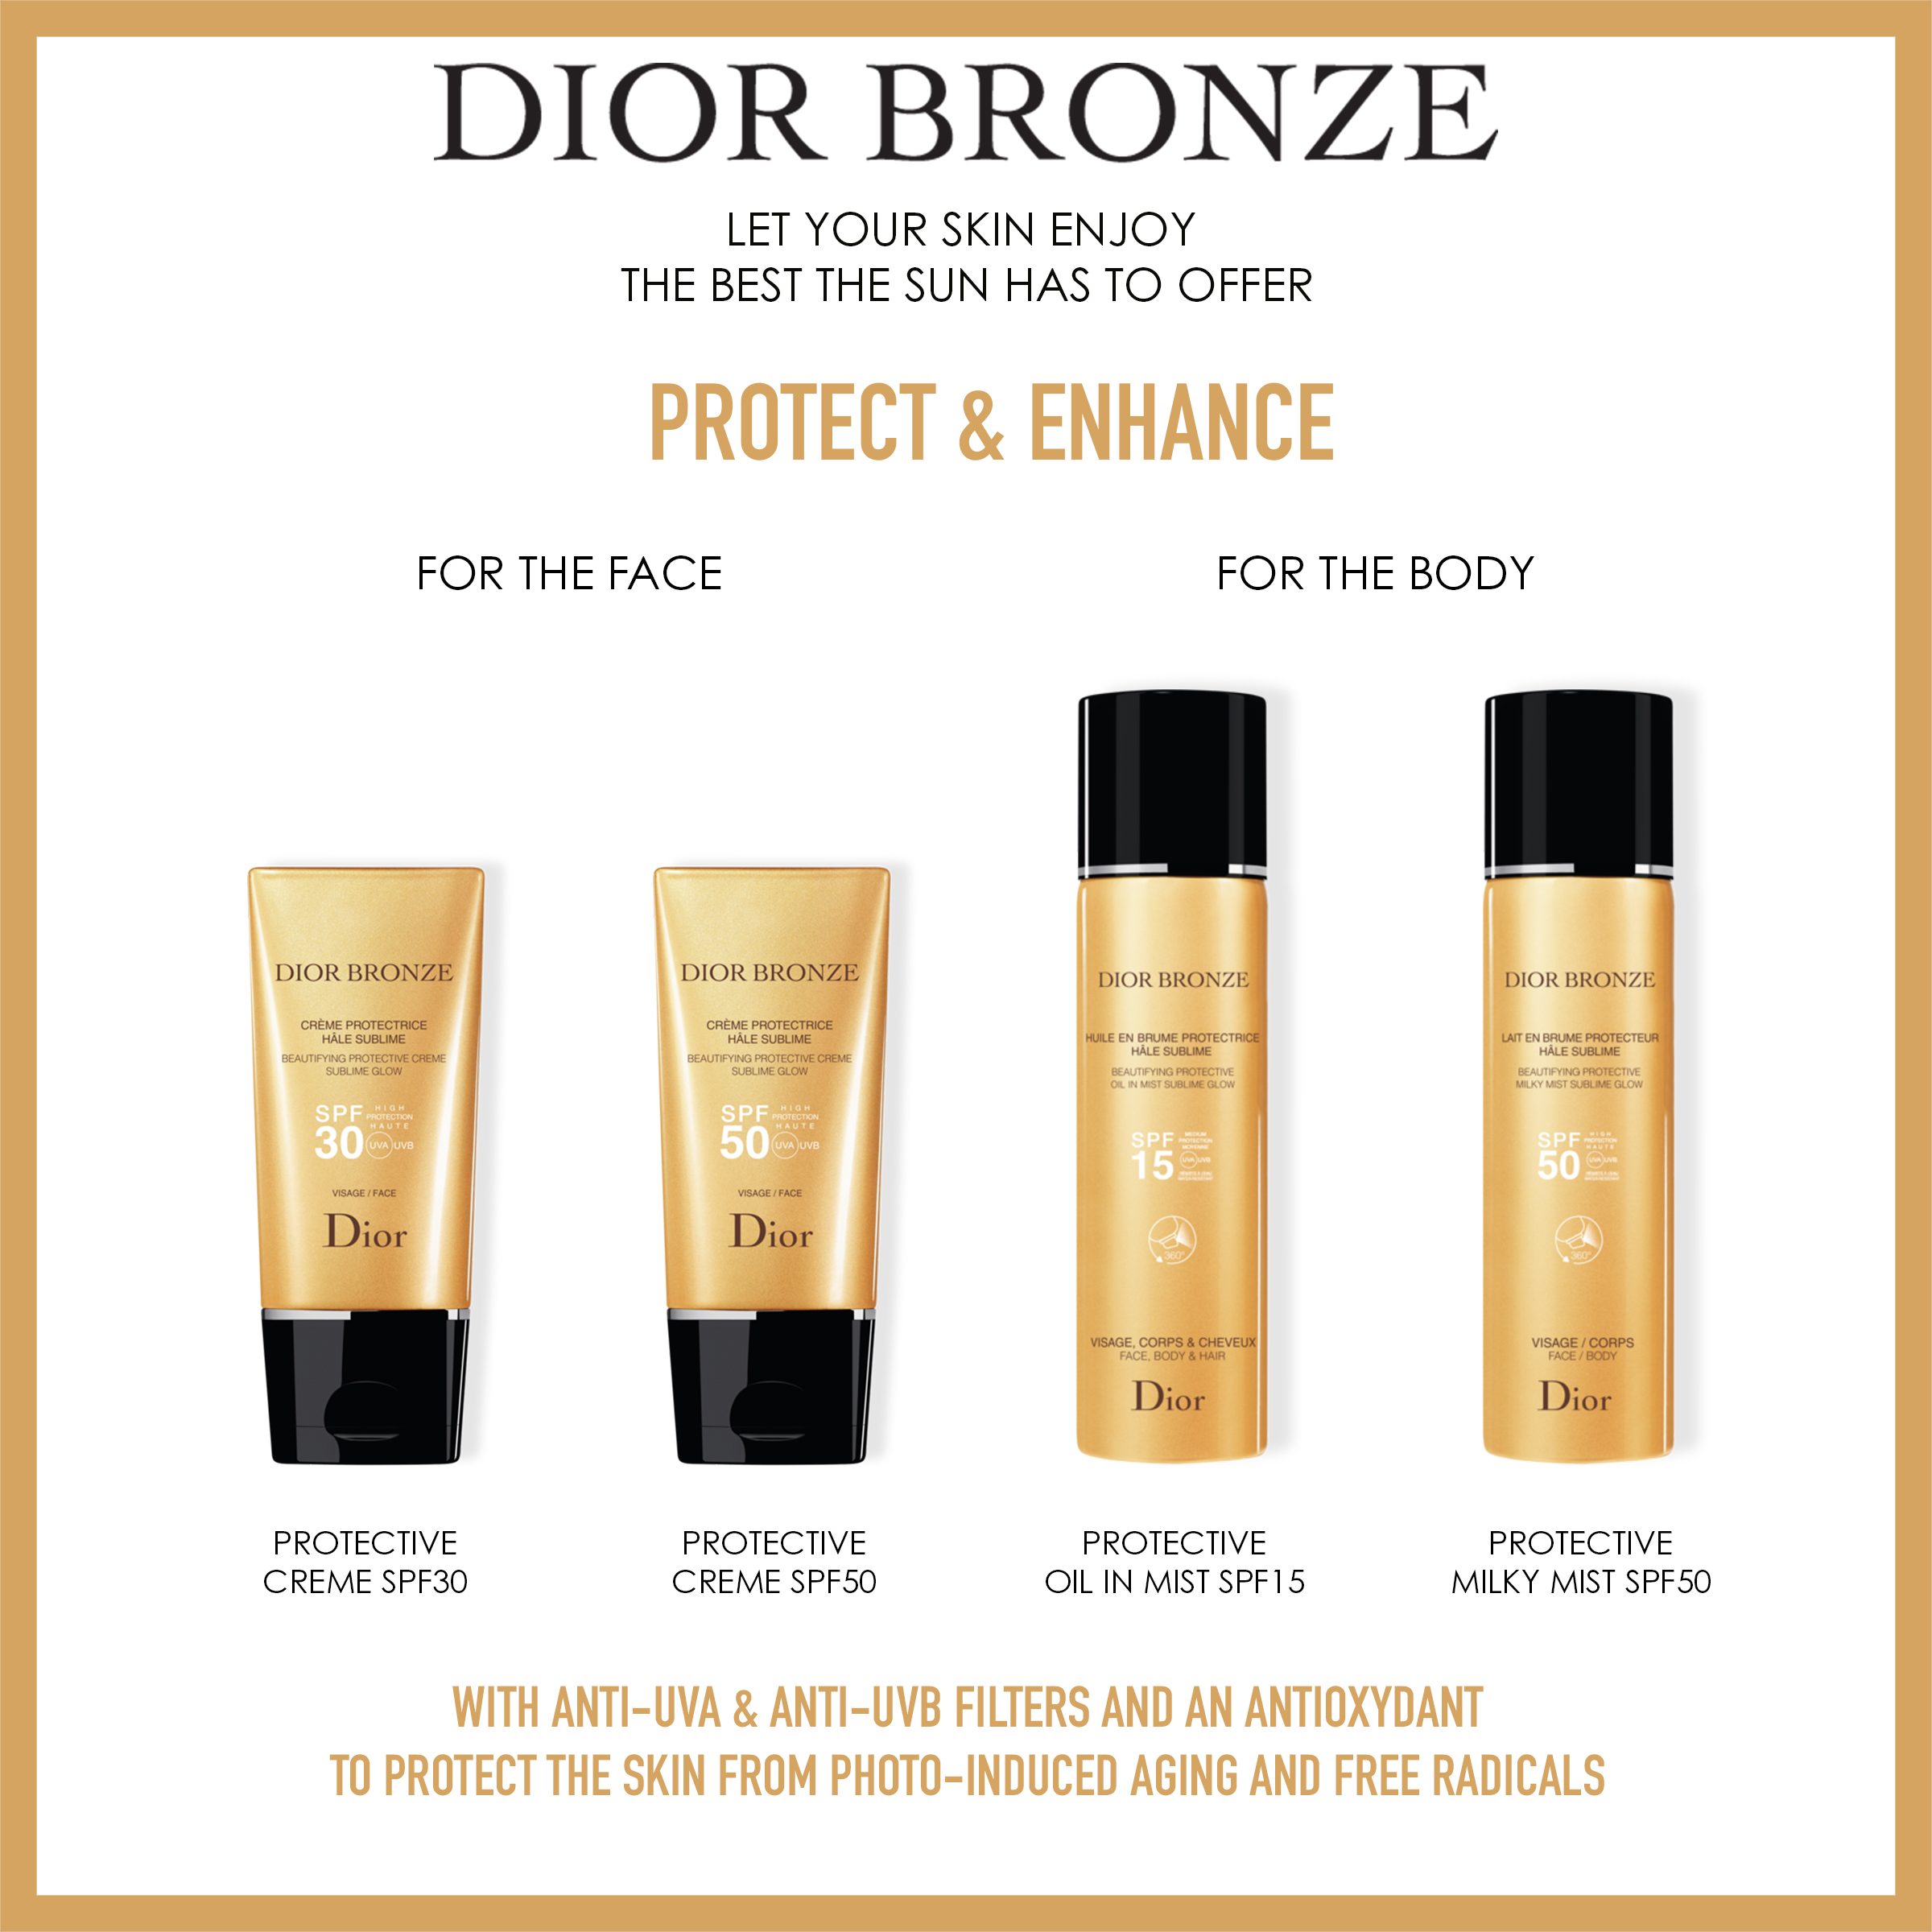 DIOR Dior Bronze Protective Milky Mist